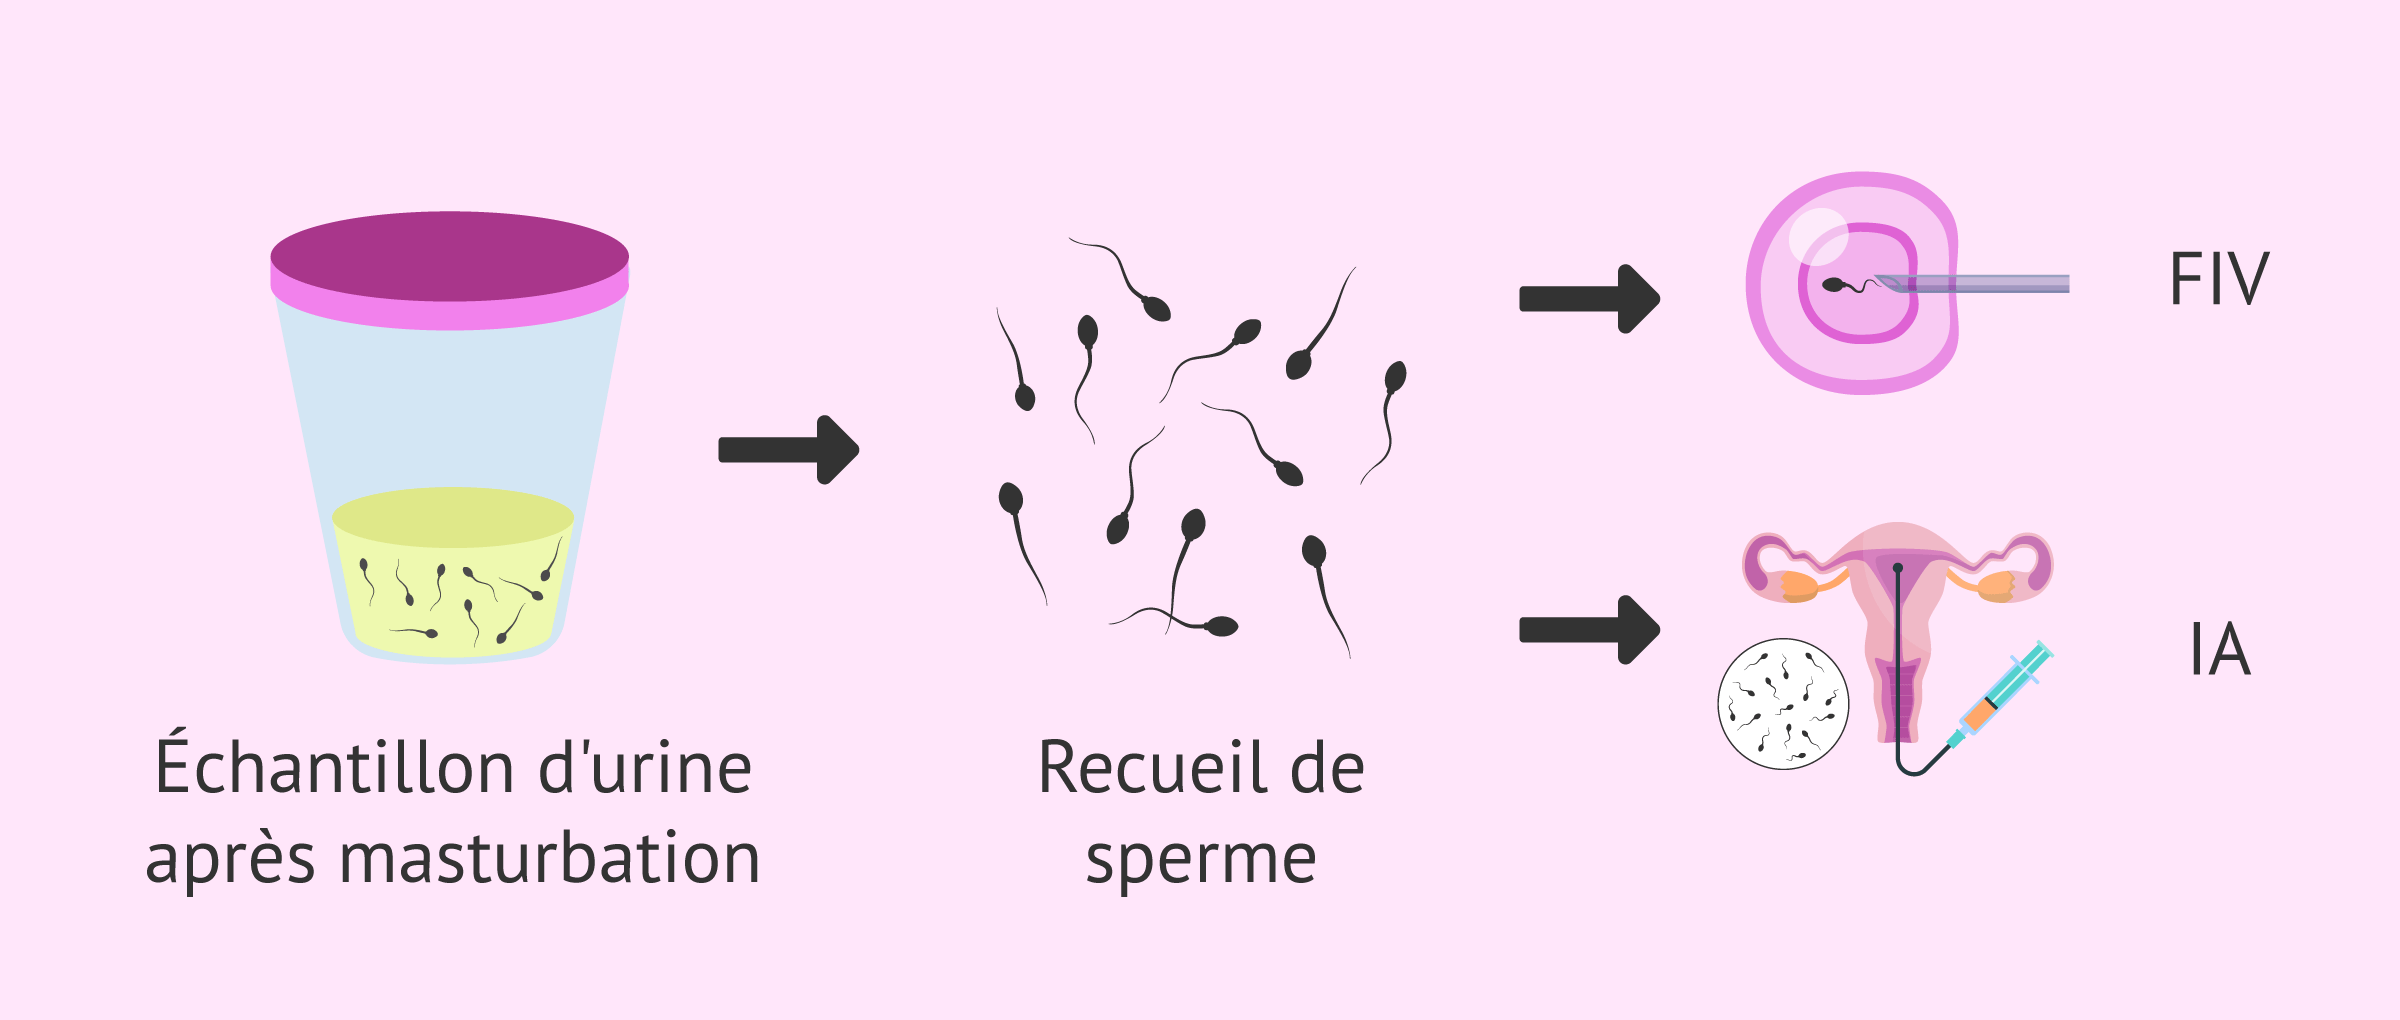 Grossesse avec éjaculation rétrograde